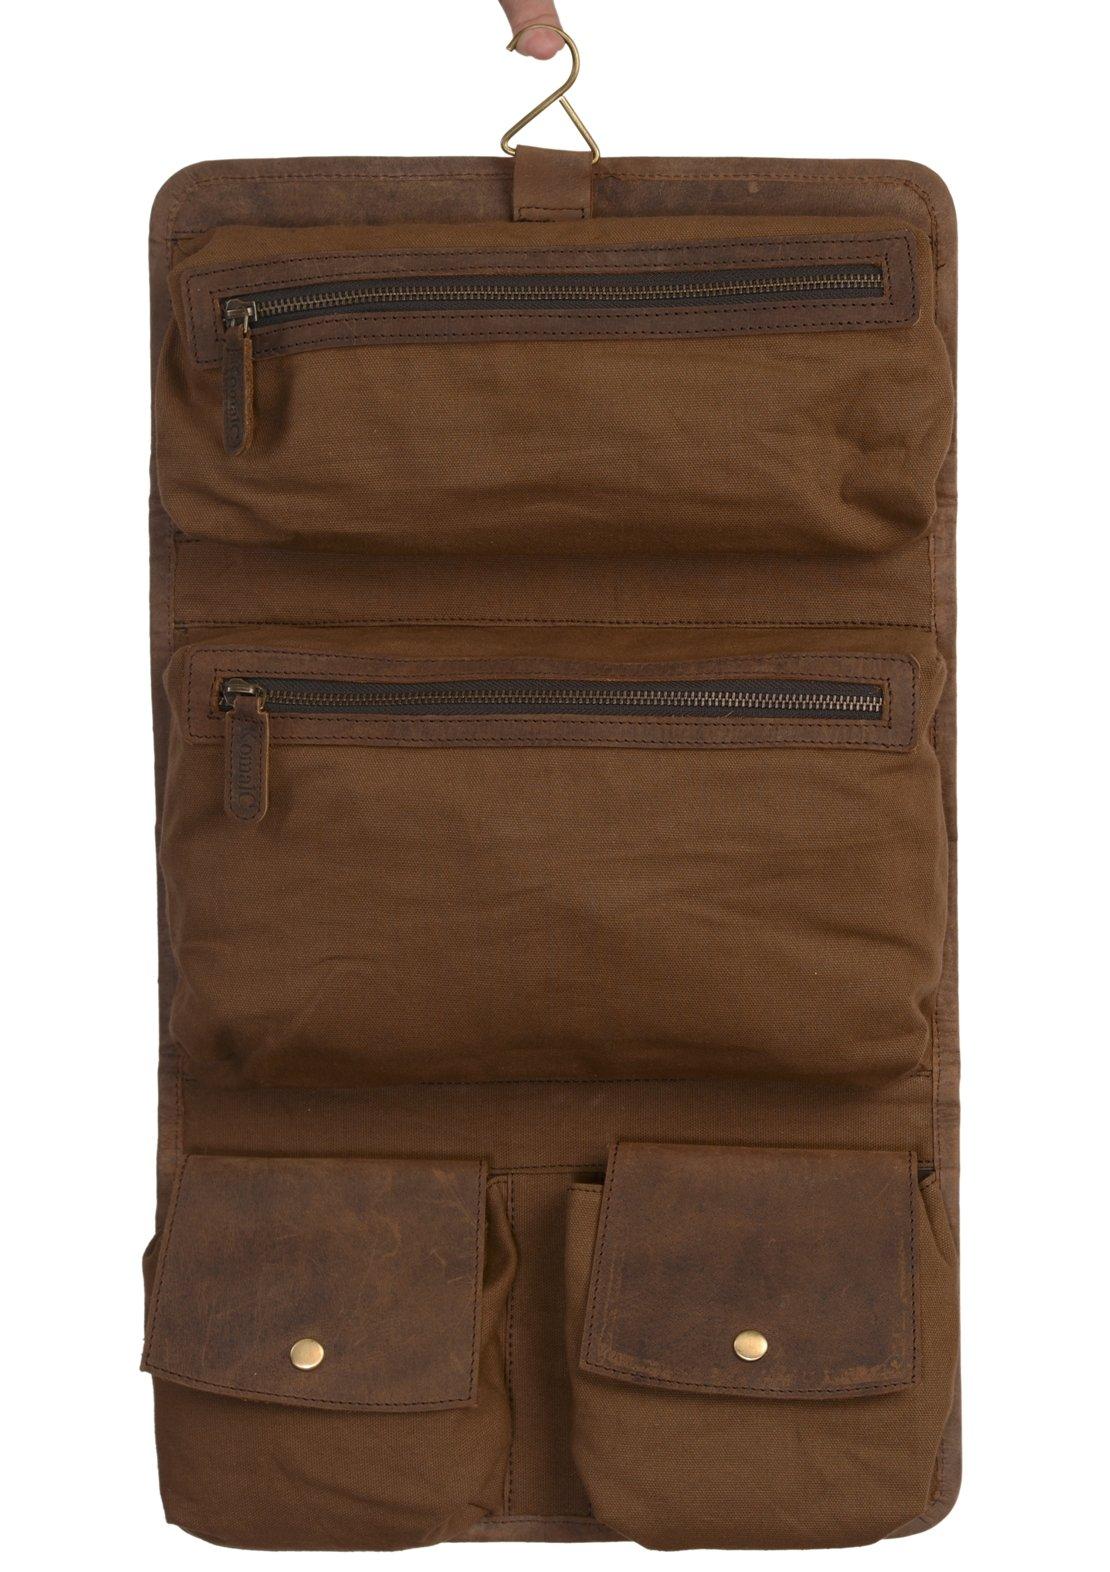 KOMALC Genuine Buffalo Leather Hanging Toiletry Bag Travel Dopp Kit ... (Distressed Tan) by KomalC